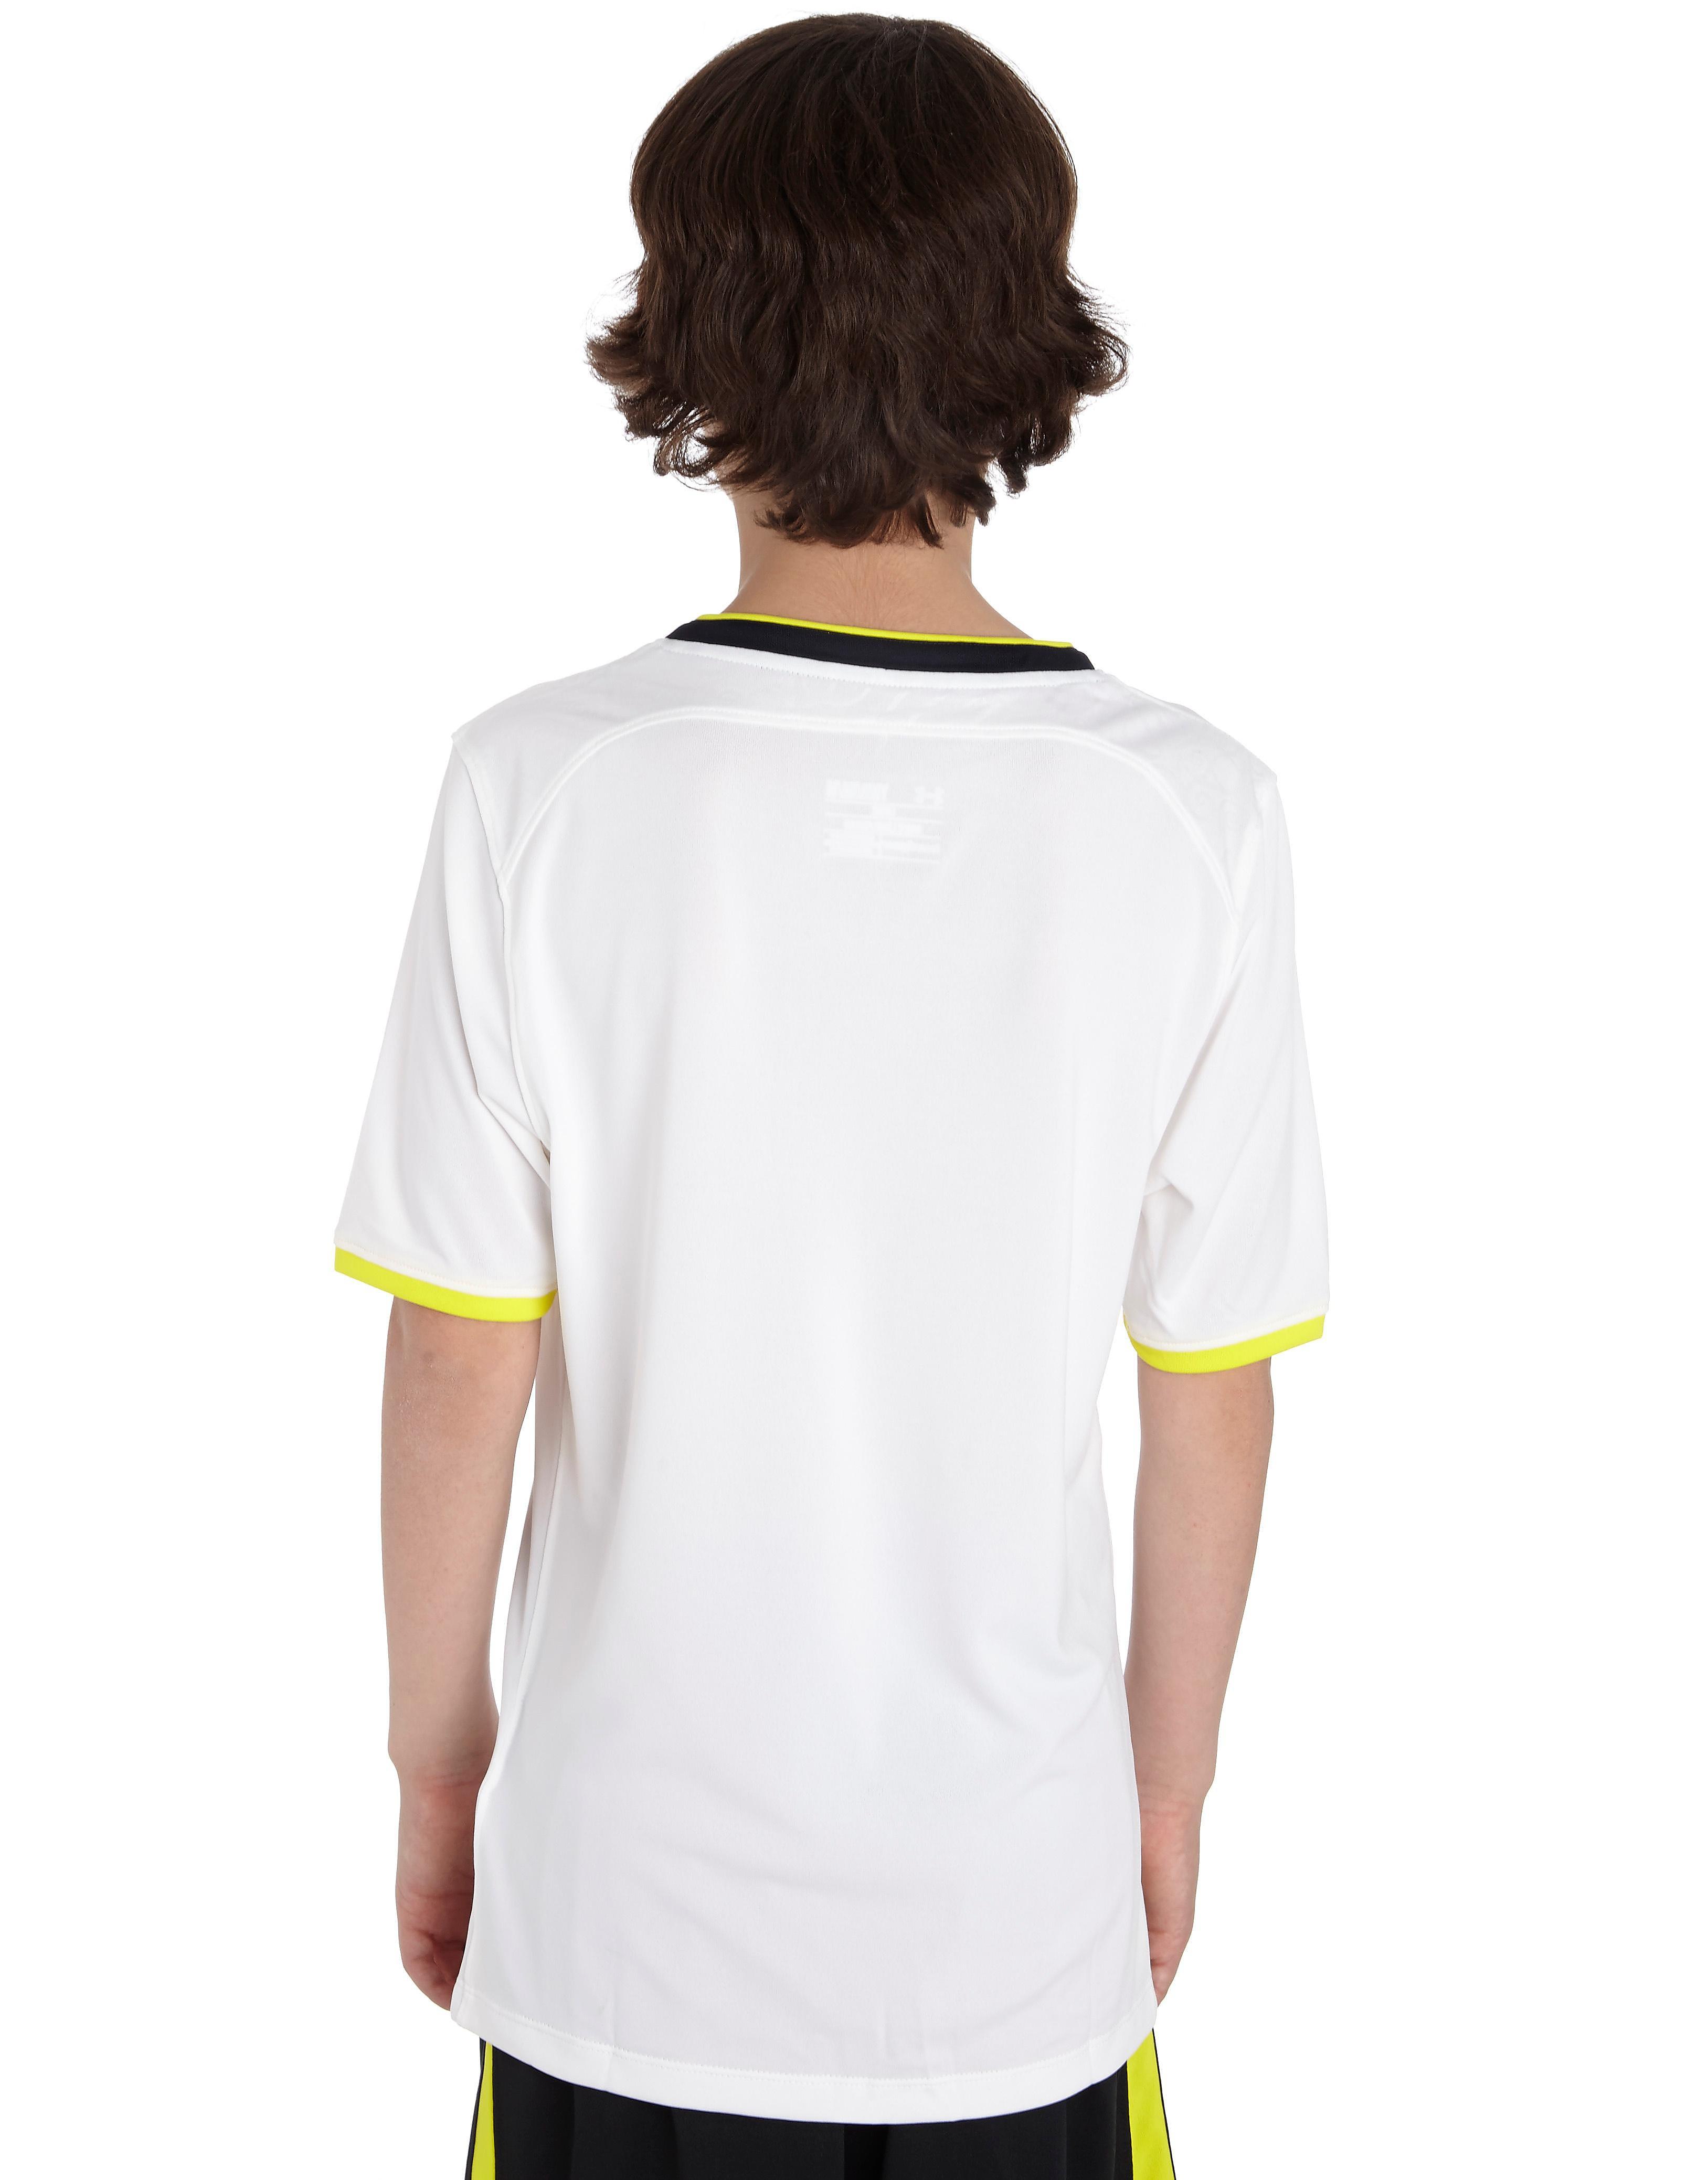 Under Armour Tottenham Hotspur 2014 Junior Home Shirt